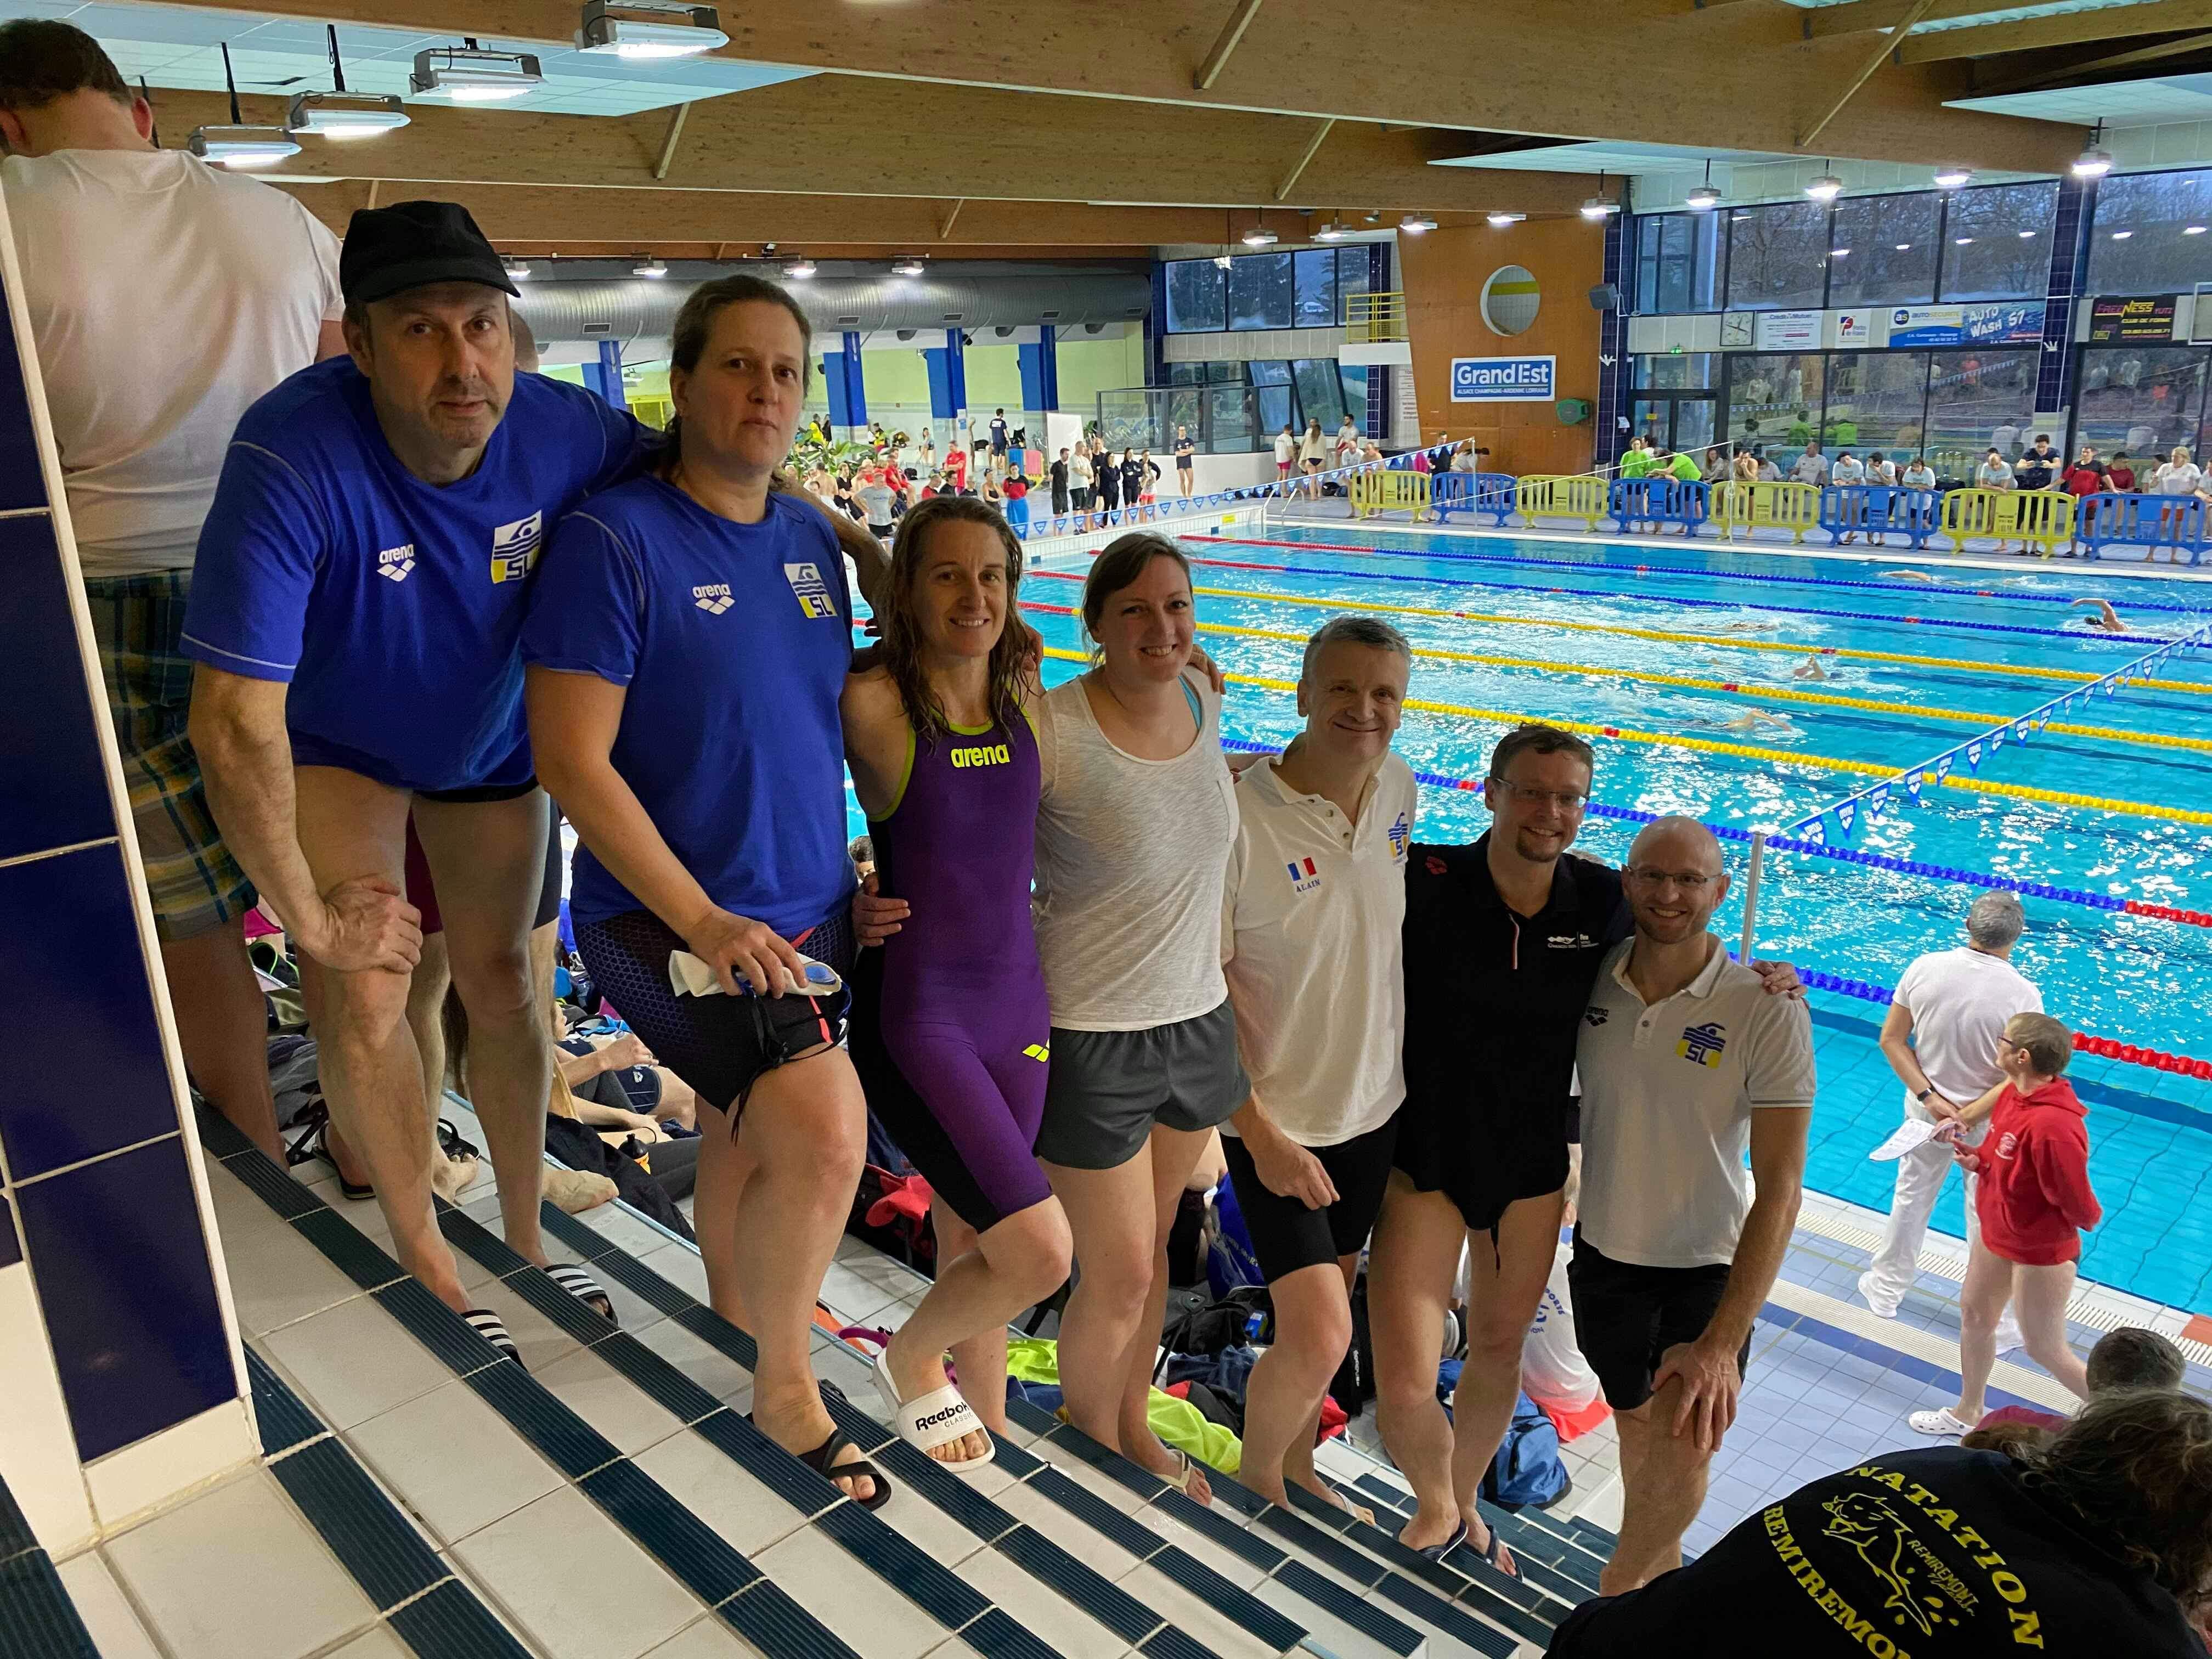 1ère place pour le Swimming Luxembourg aux Interclubs Masters Grand Est (France) / 6 records nationaux !